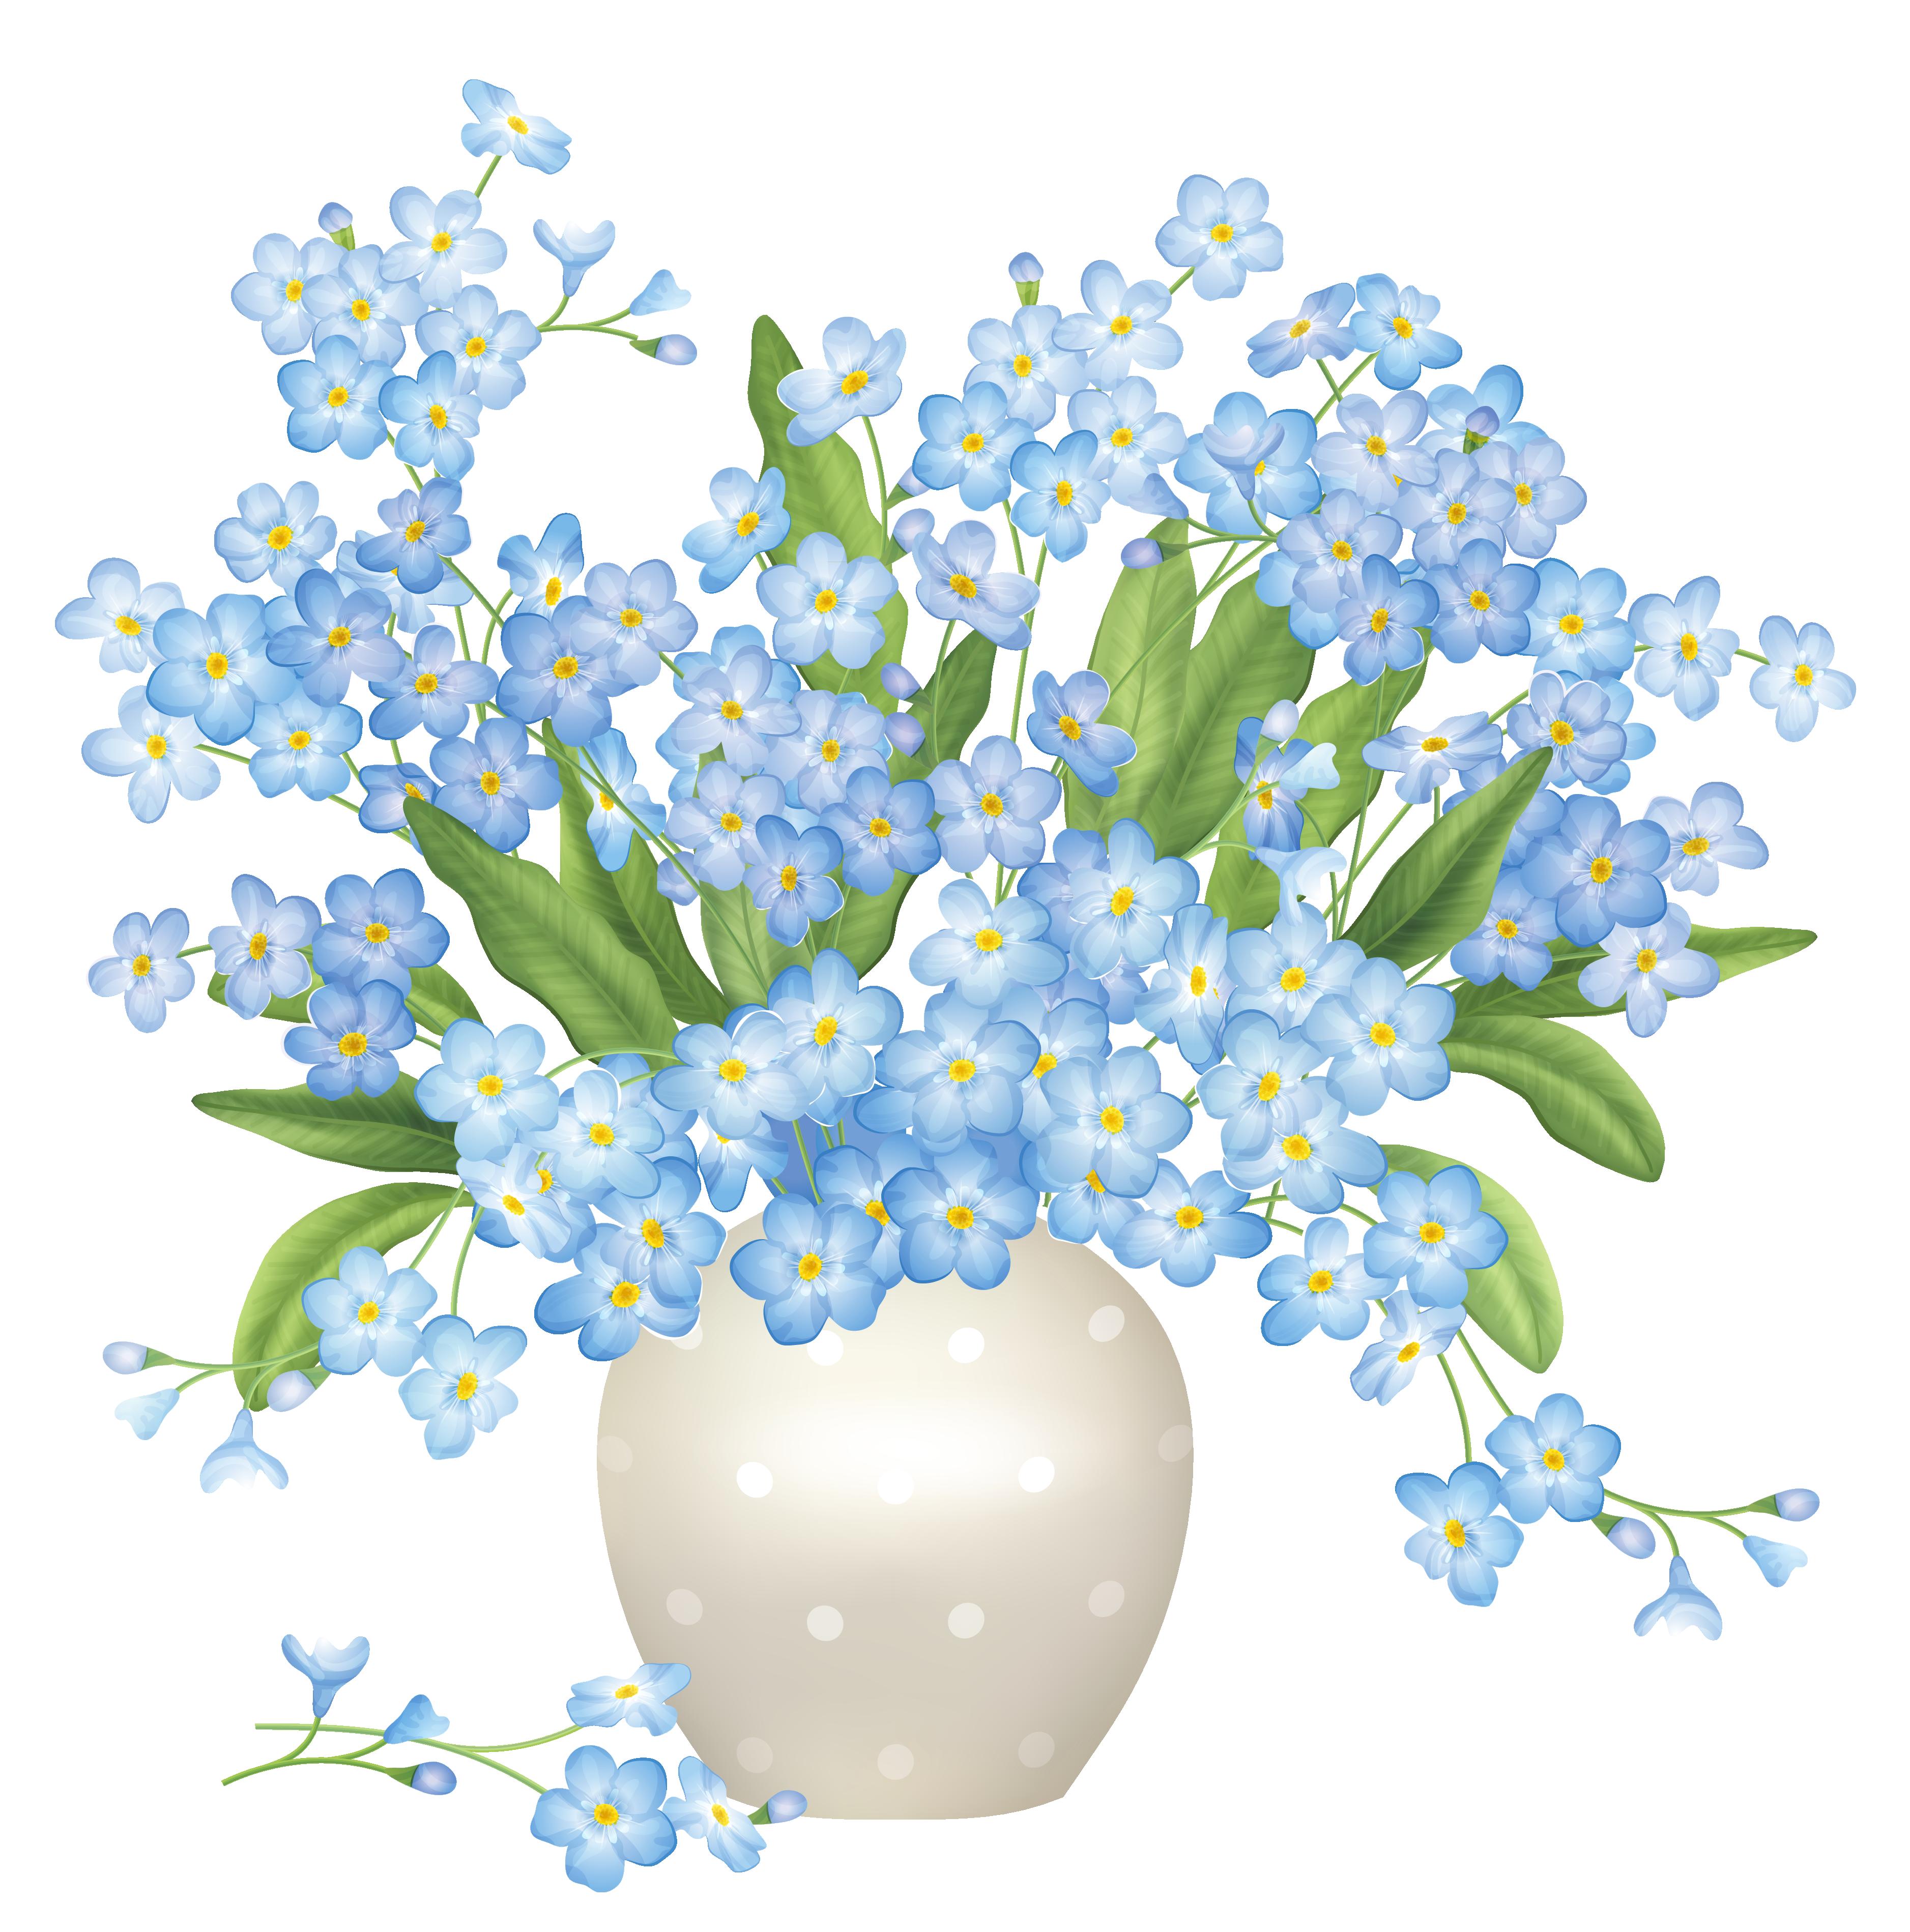 Blue clipart transparent. Flowers vase png gallery